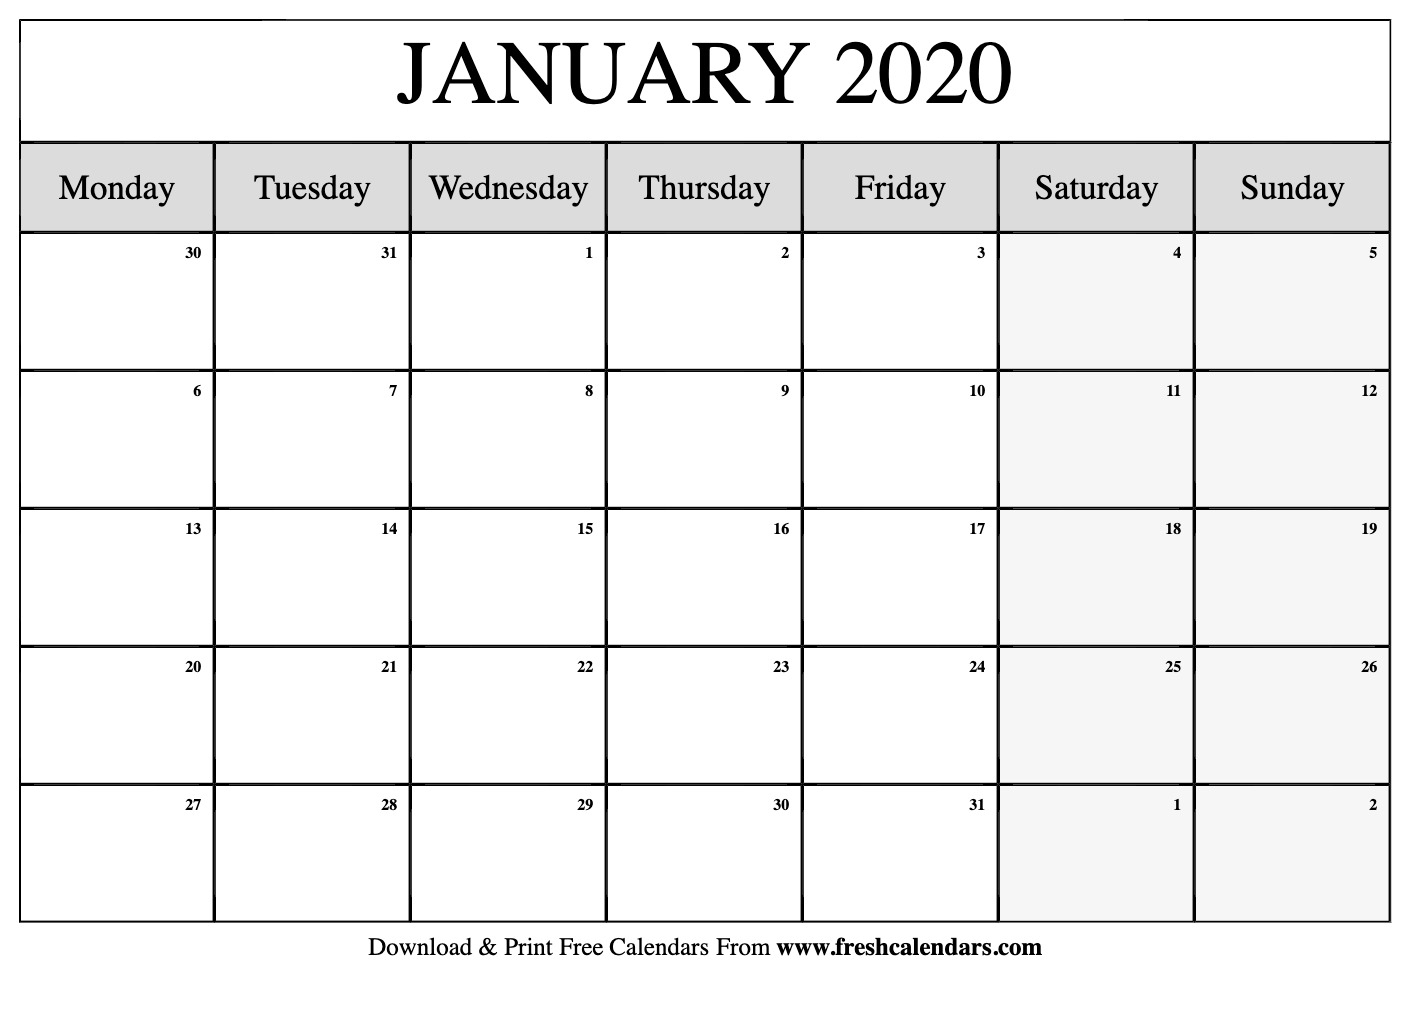 Free Printable January 2020 Calendar within Www.freshcalendars.com December 2020